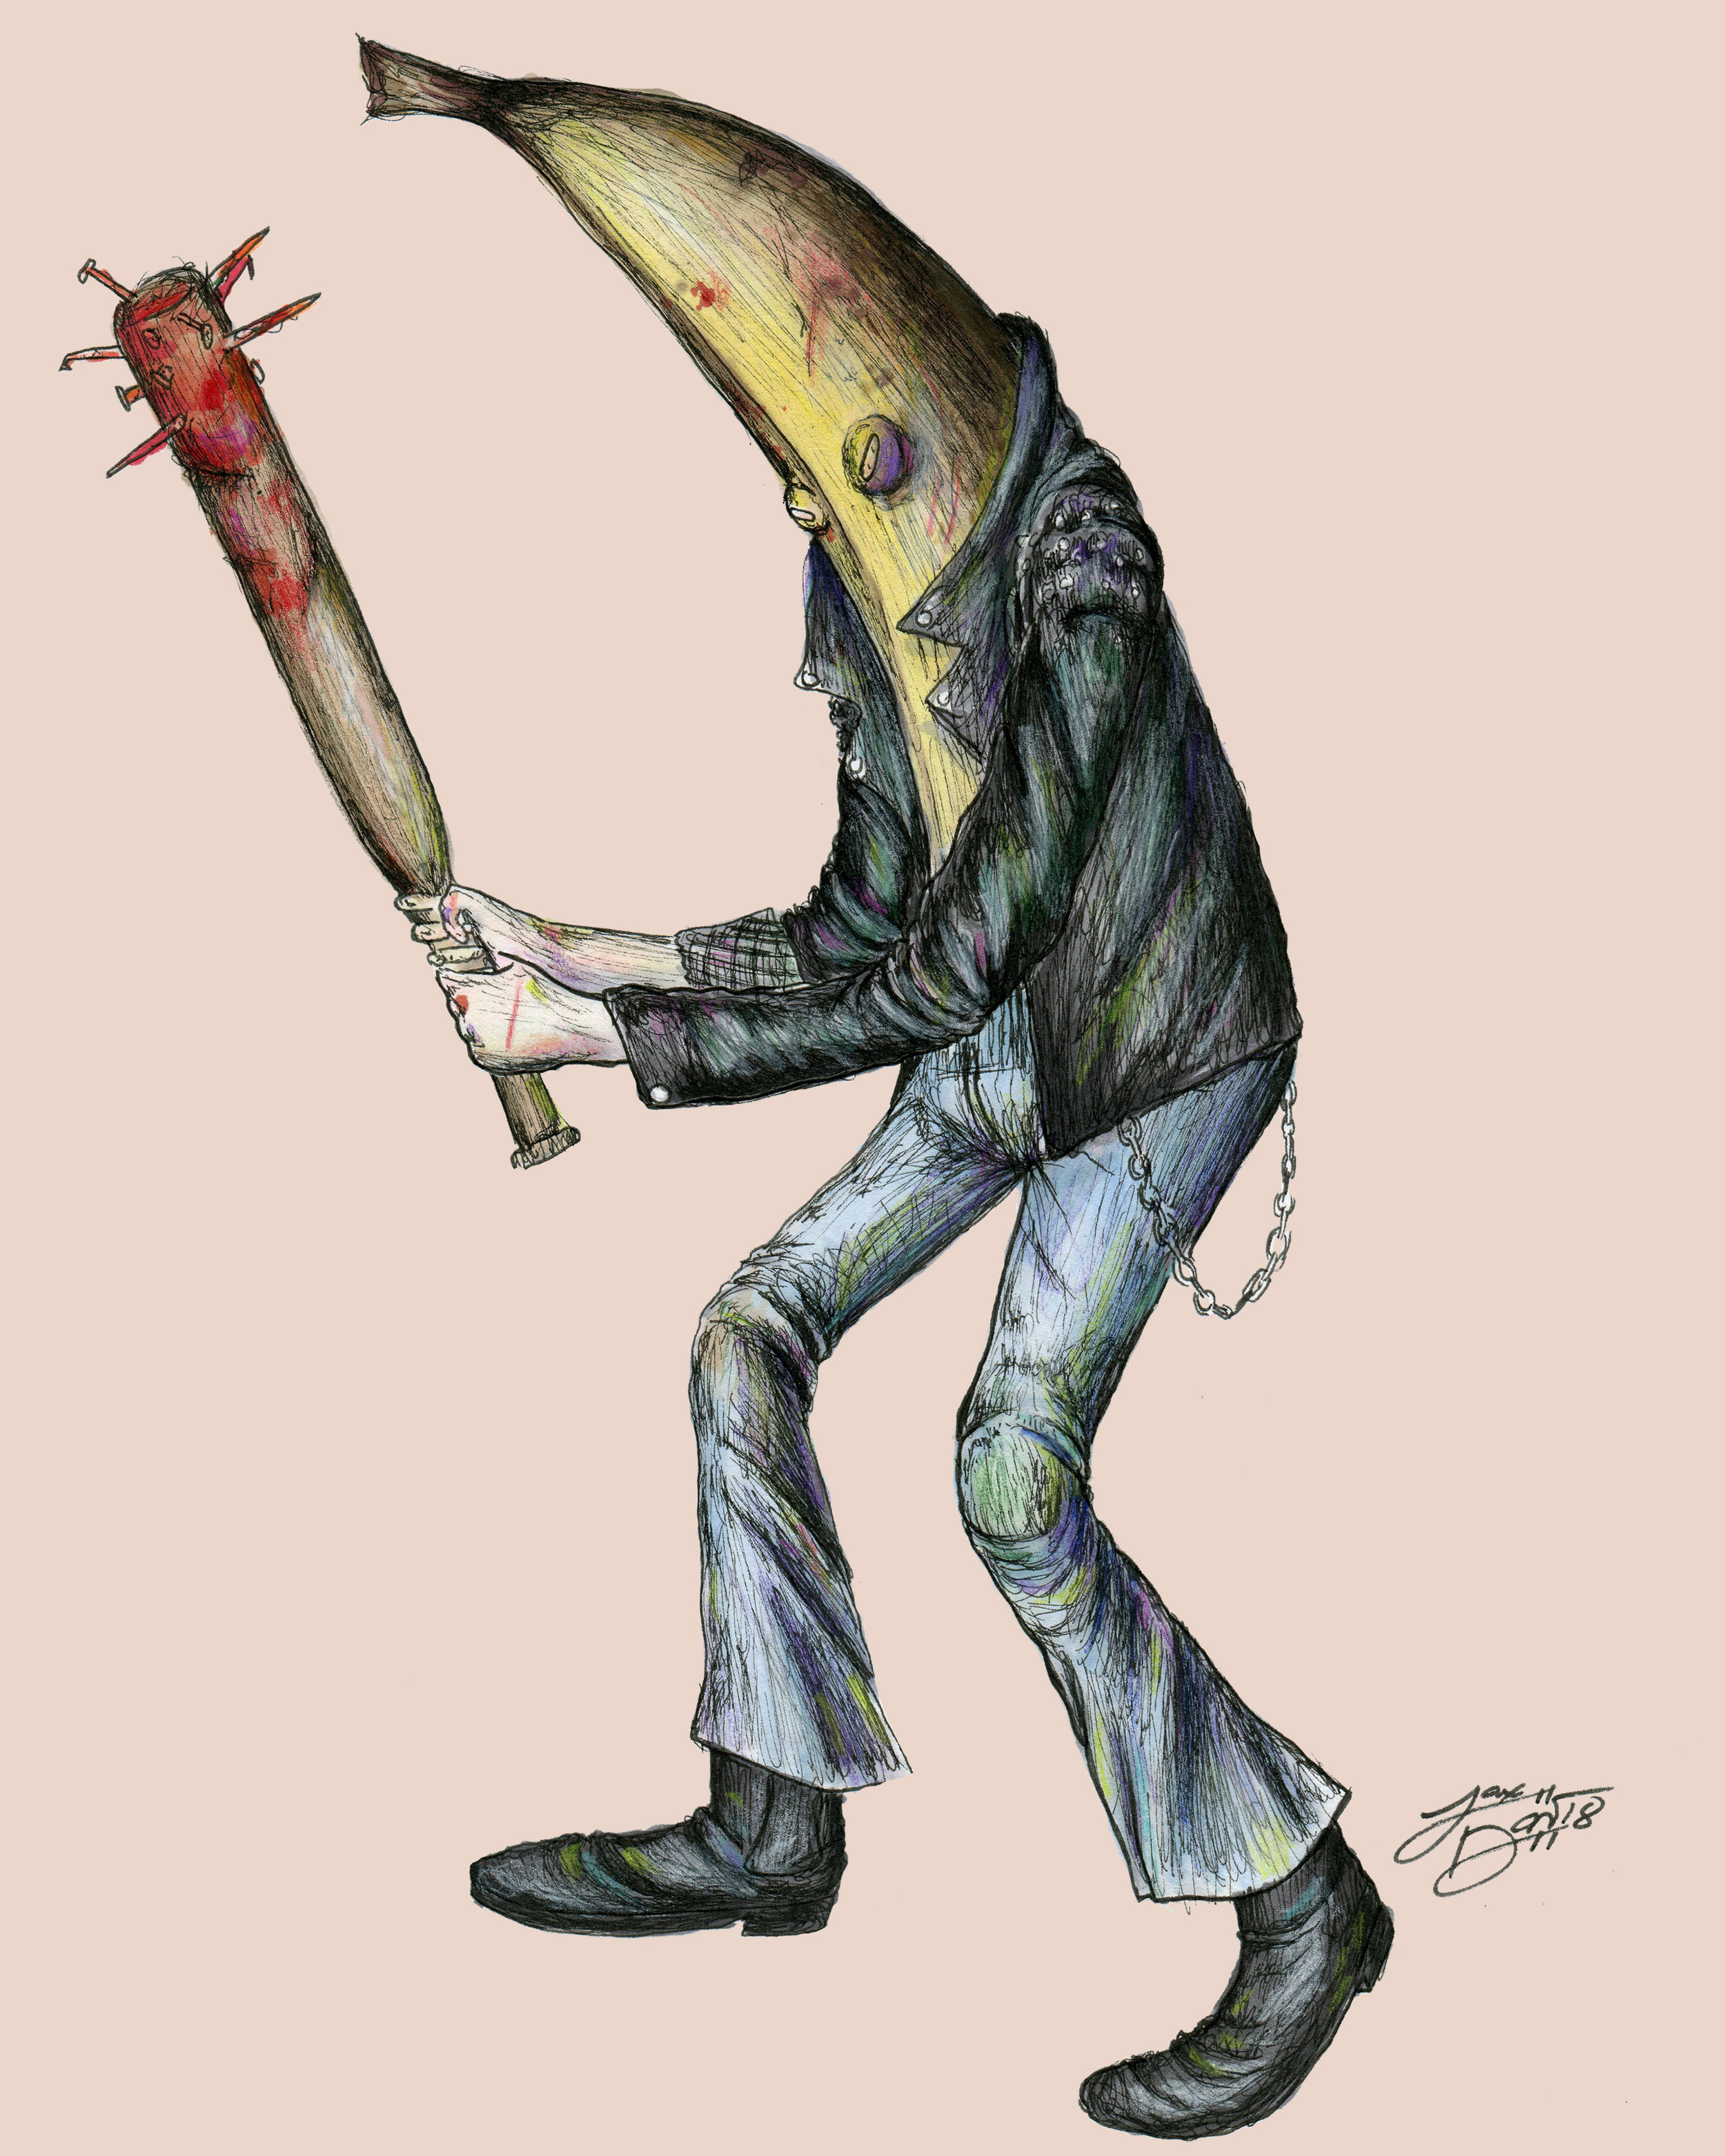 The Bad Banana